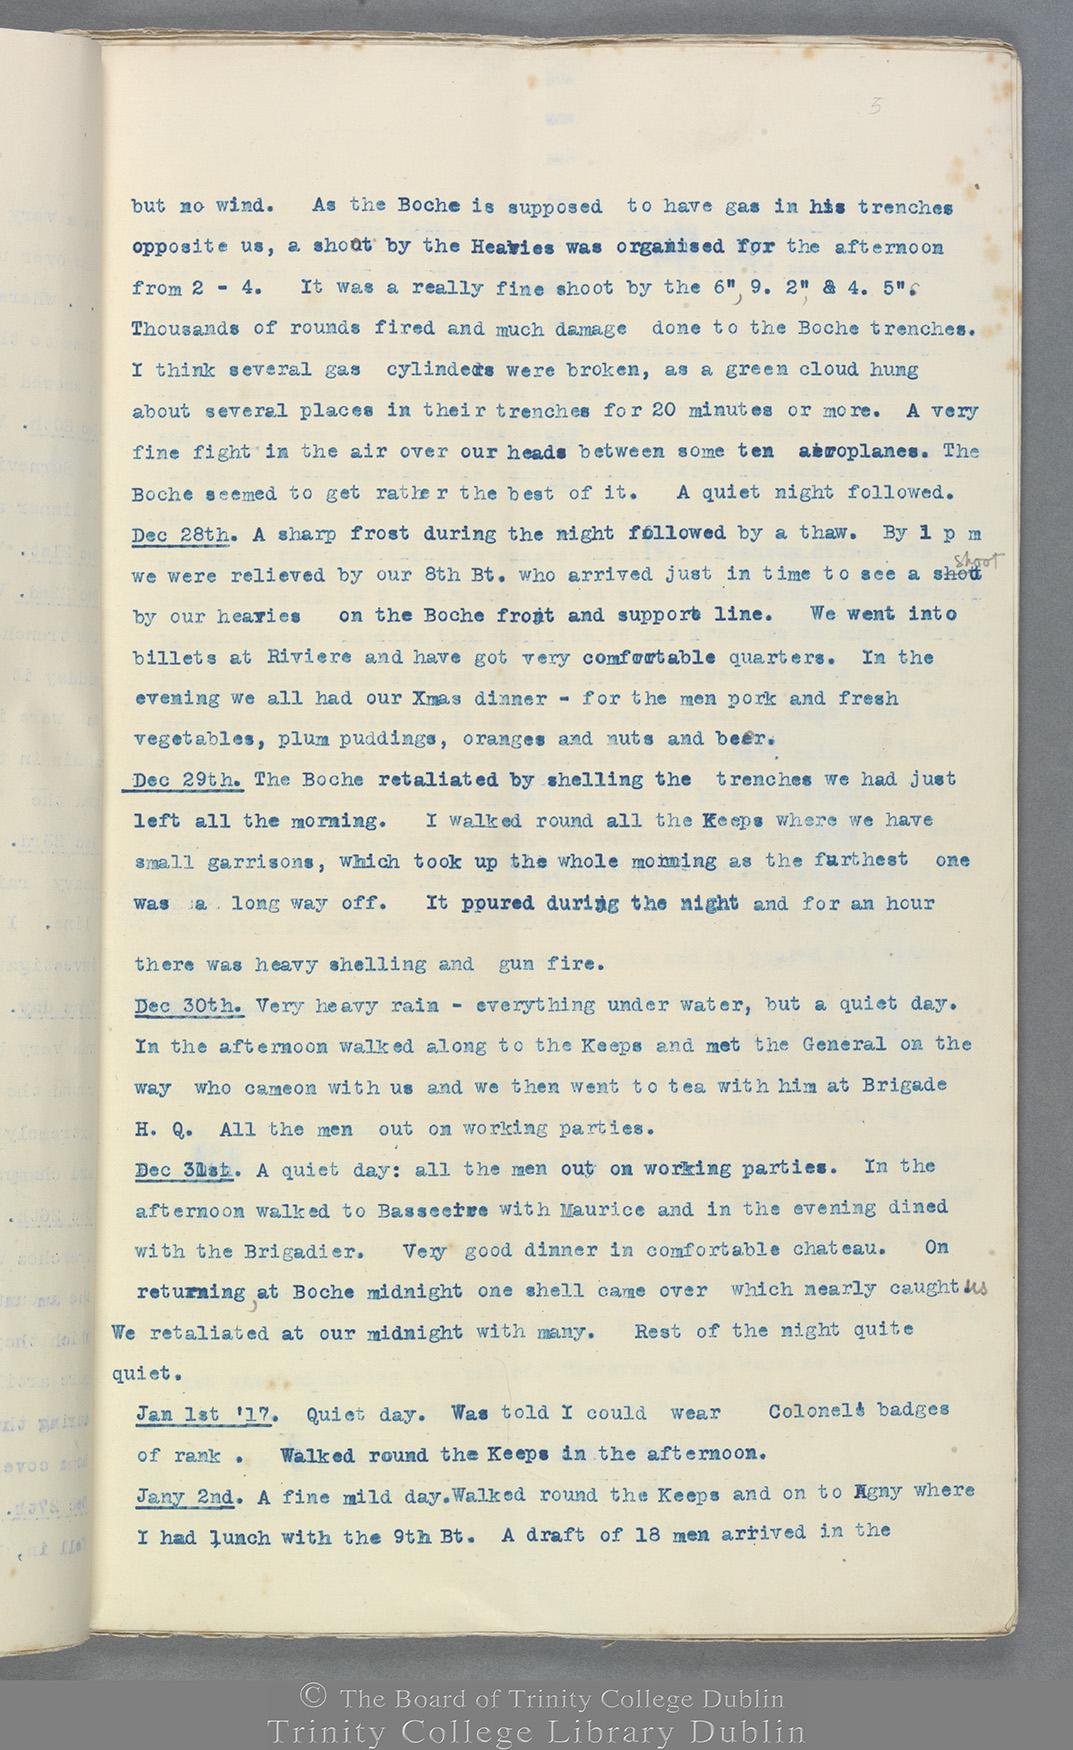 TCD MS 10822 folio 5 recto